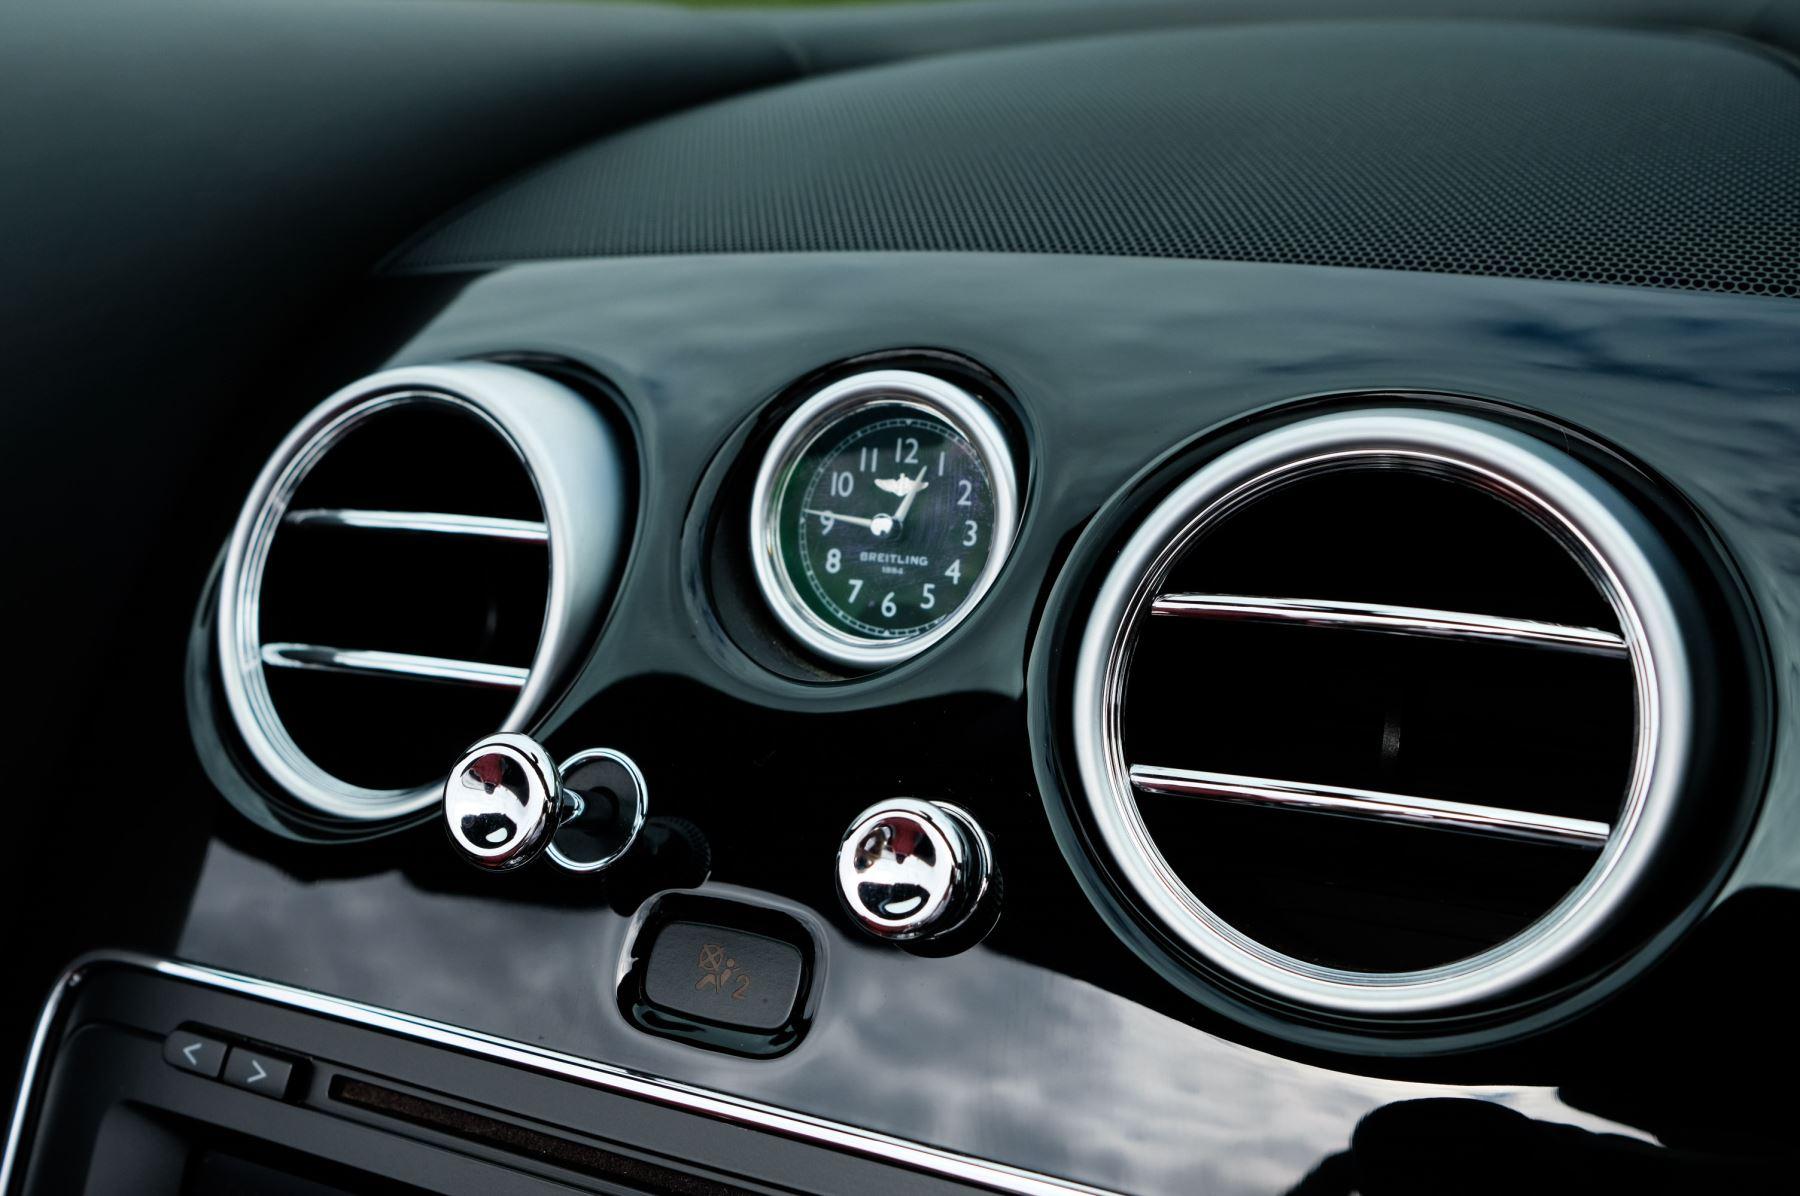 Bentley Continental GTC 6.0 W12 Speed - Massage Seats & Ventilation - Neck Warmer - Rear View Camera image 19